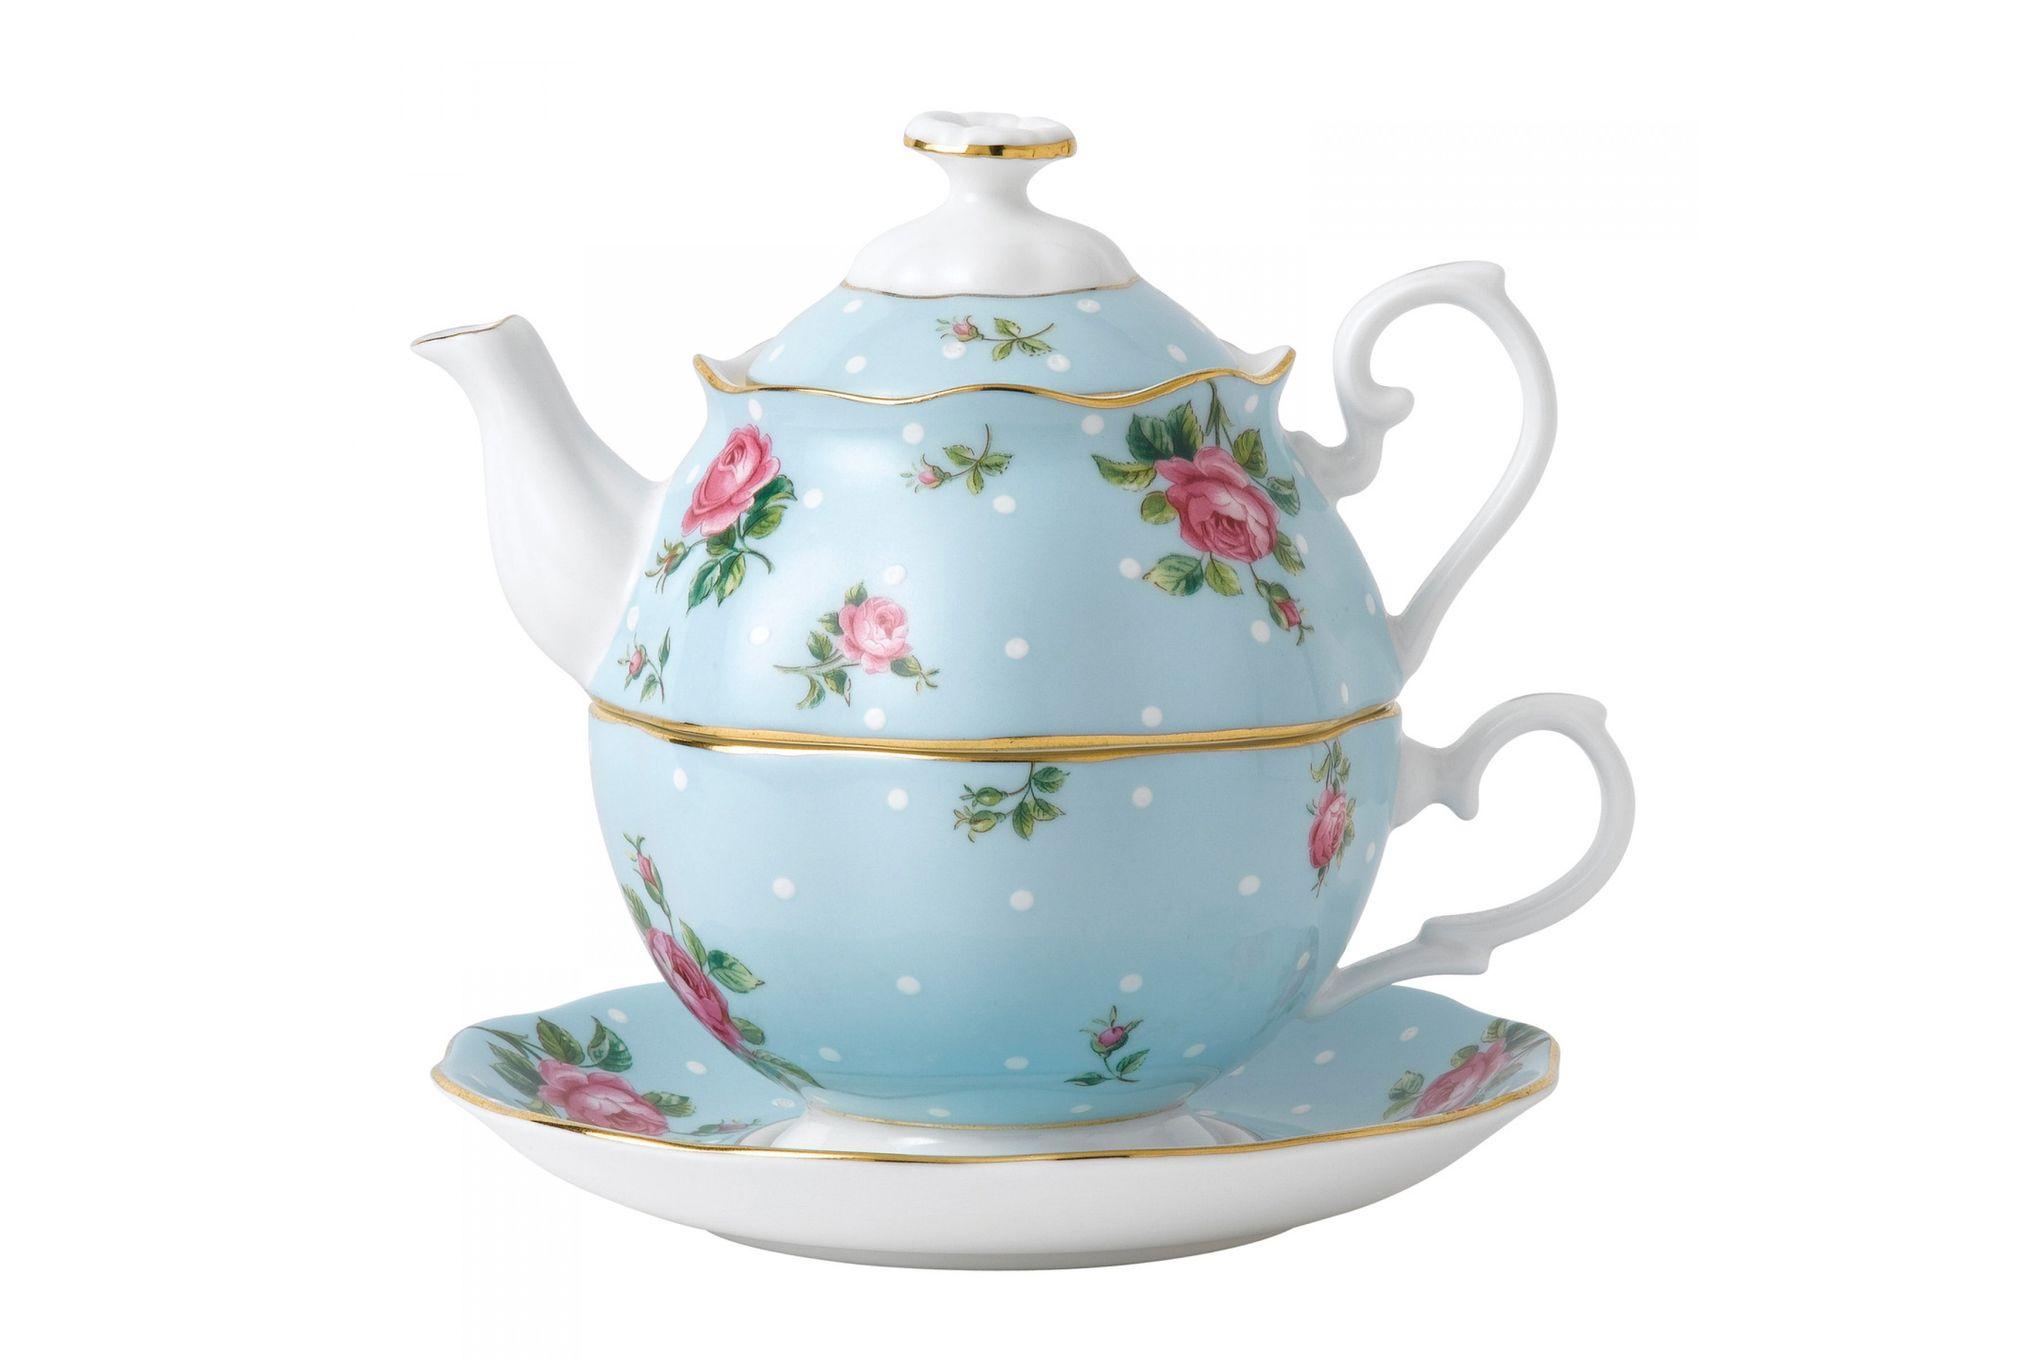 Royal Albert Polka Blue Tea For One thumb 1